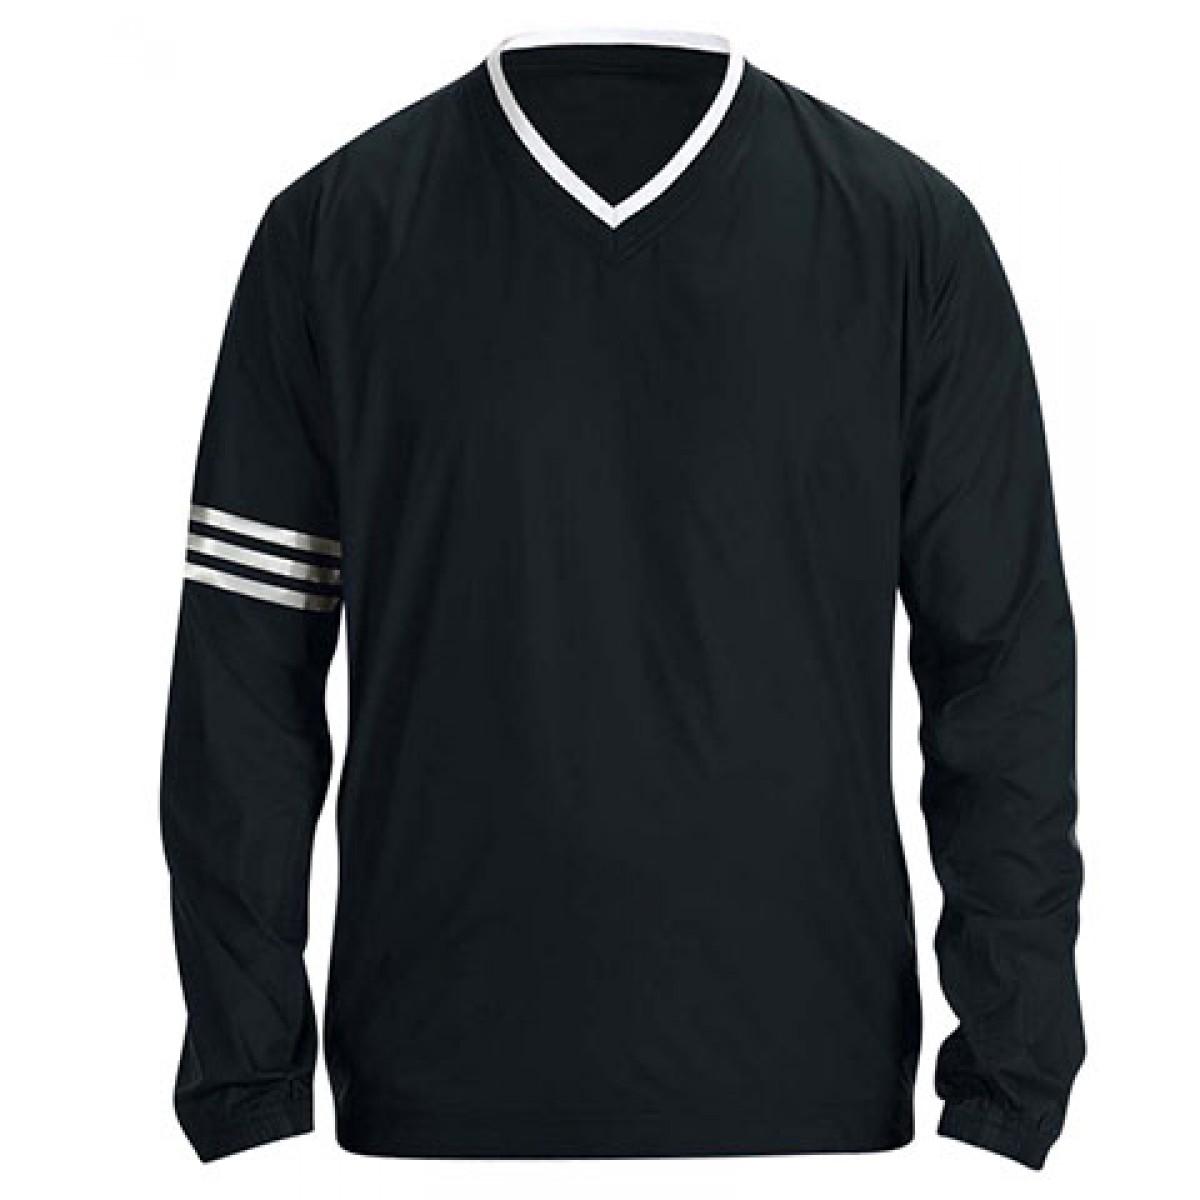 Adidas ClimaLite V-Neck Long Sleeve Wind Shirt-Black-L